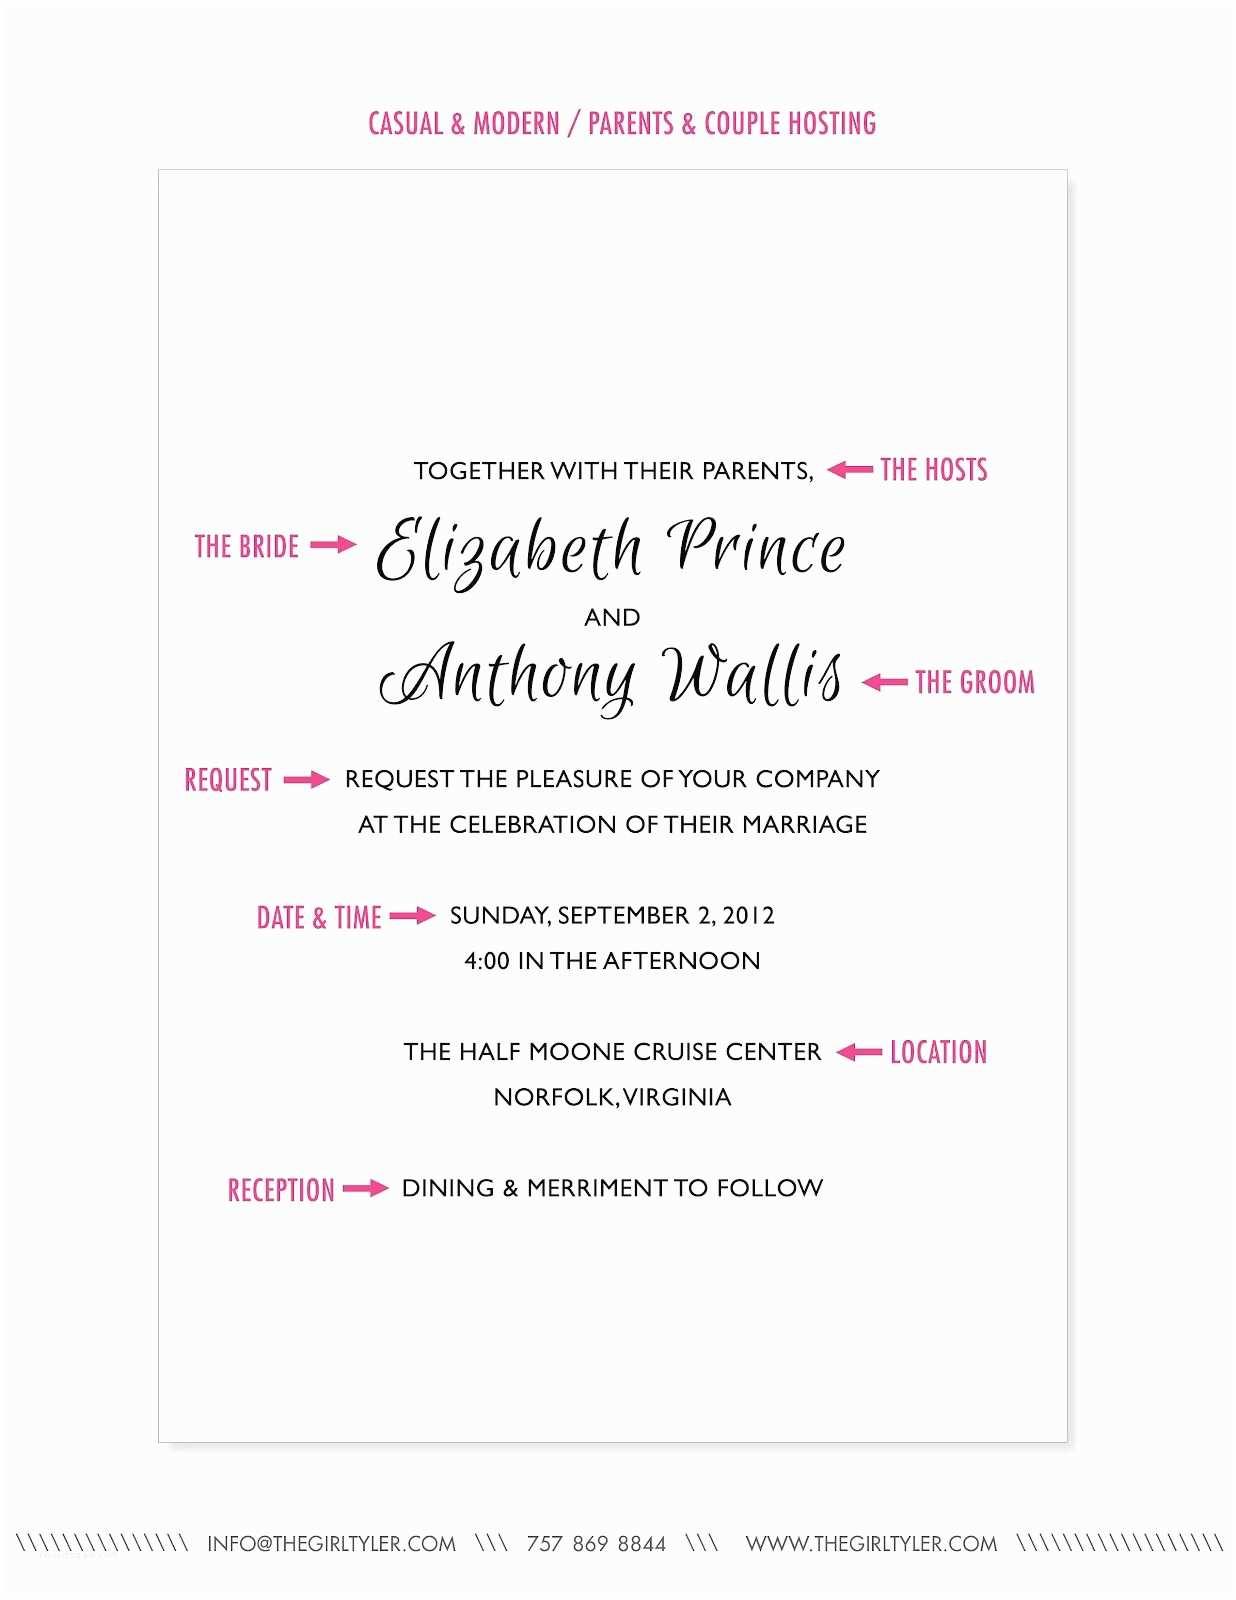 Wedding Ceremony Invitation Wording Wedding Ceremony Invitation Wording Wedding Party Invite